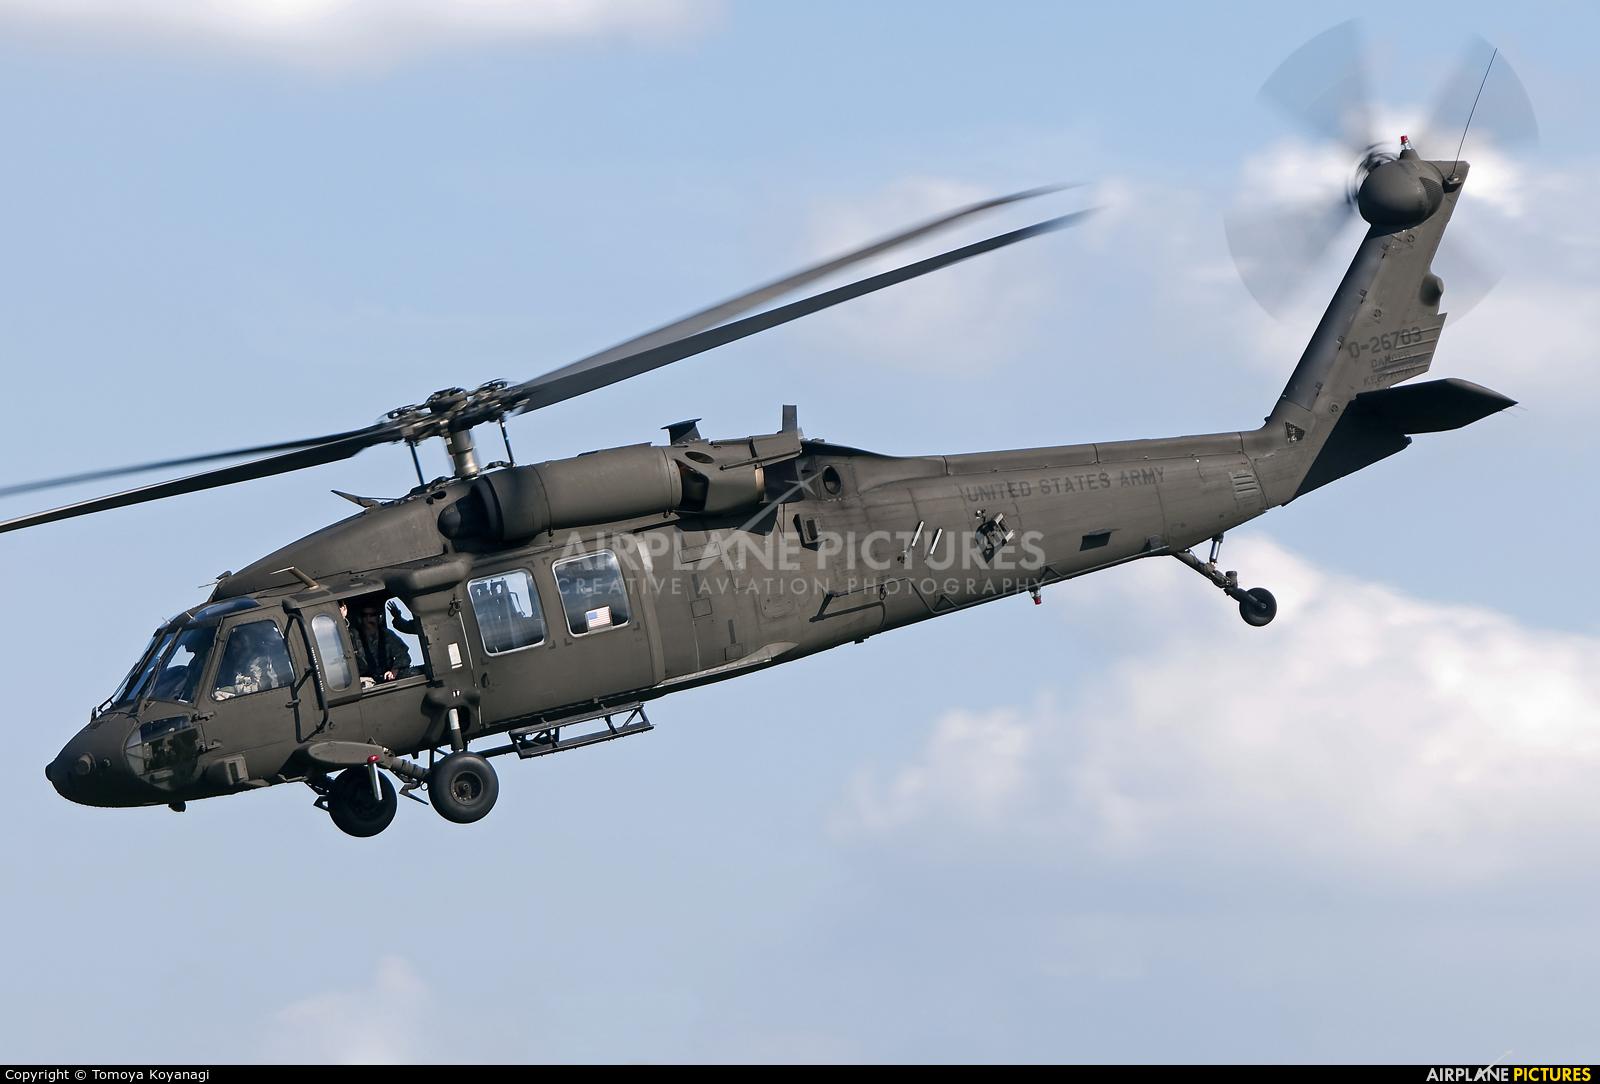 USA - Army 0-26703 aircraft at Tachikawa